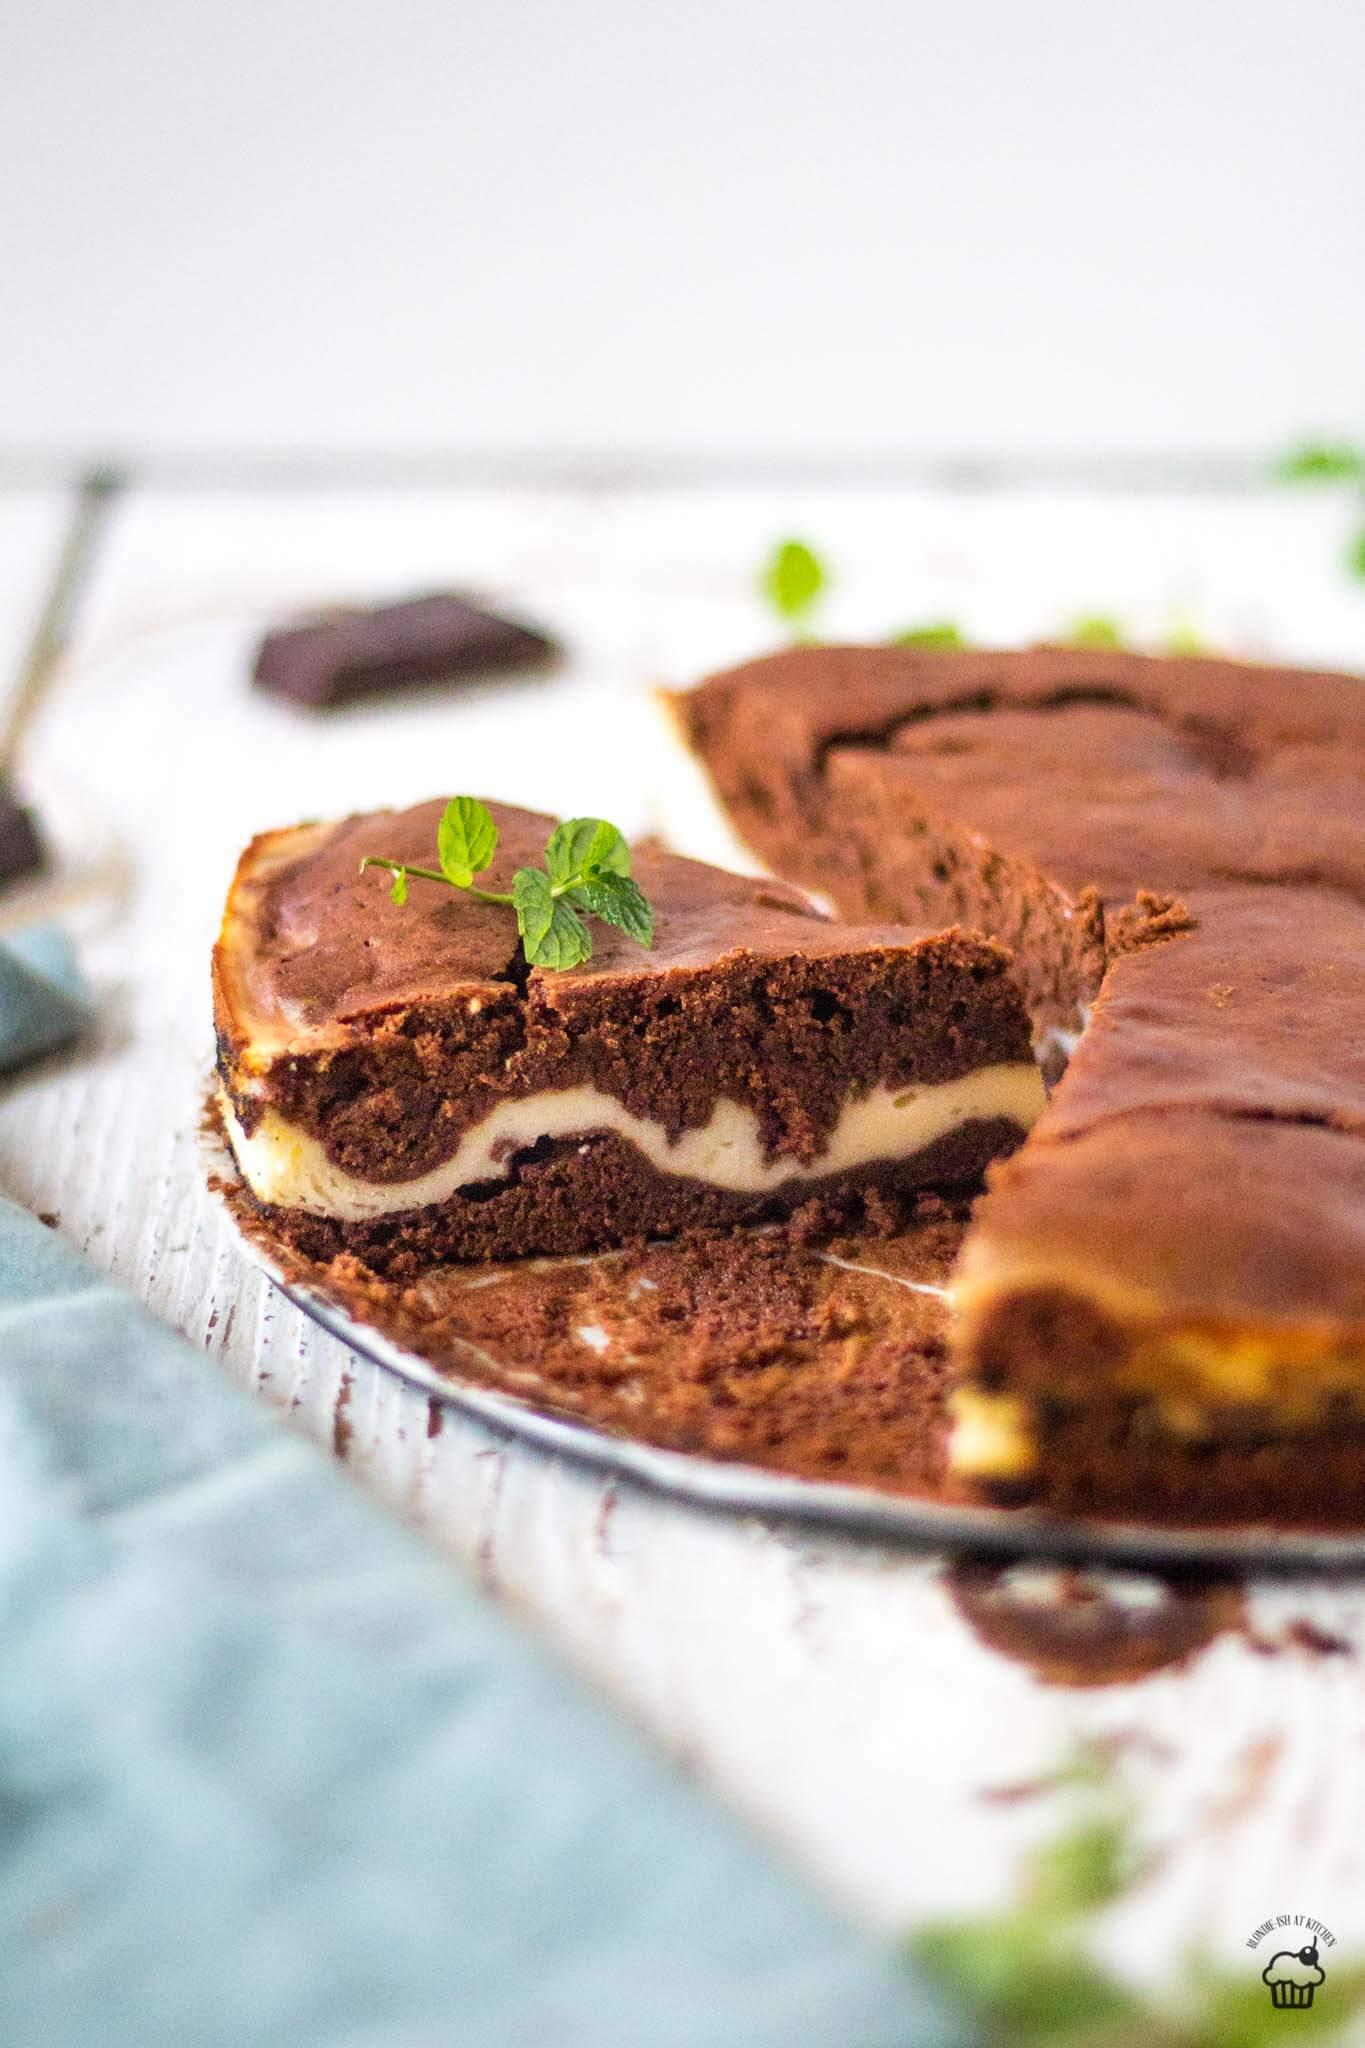 čokoládový koláč plnený ricottou